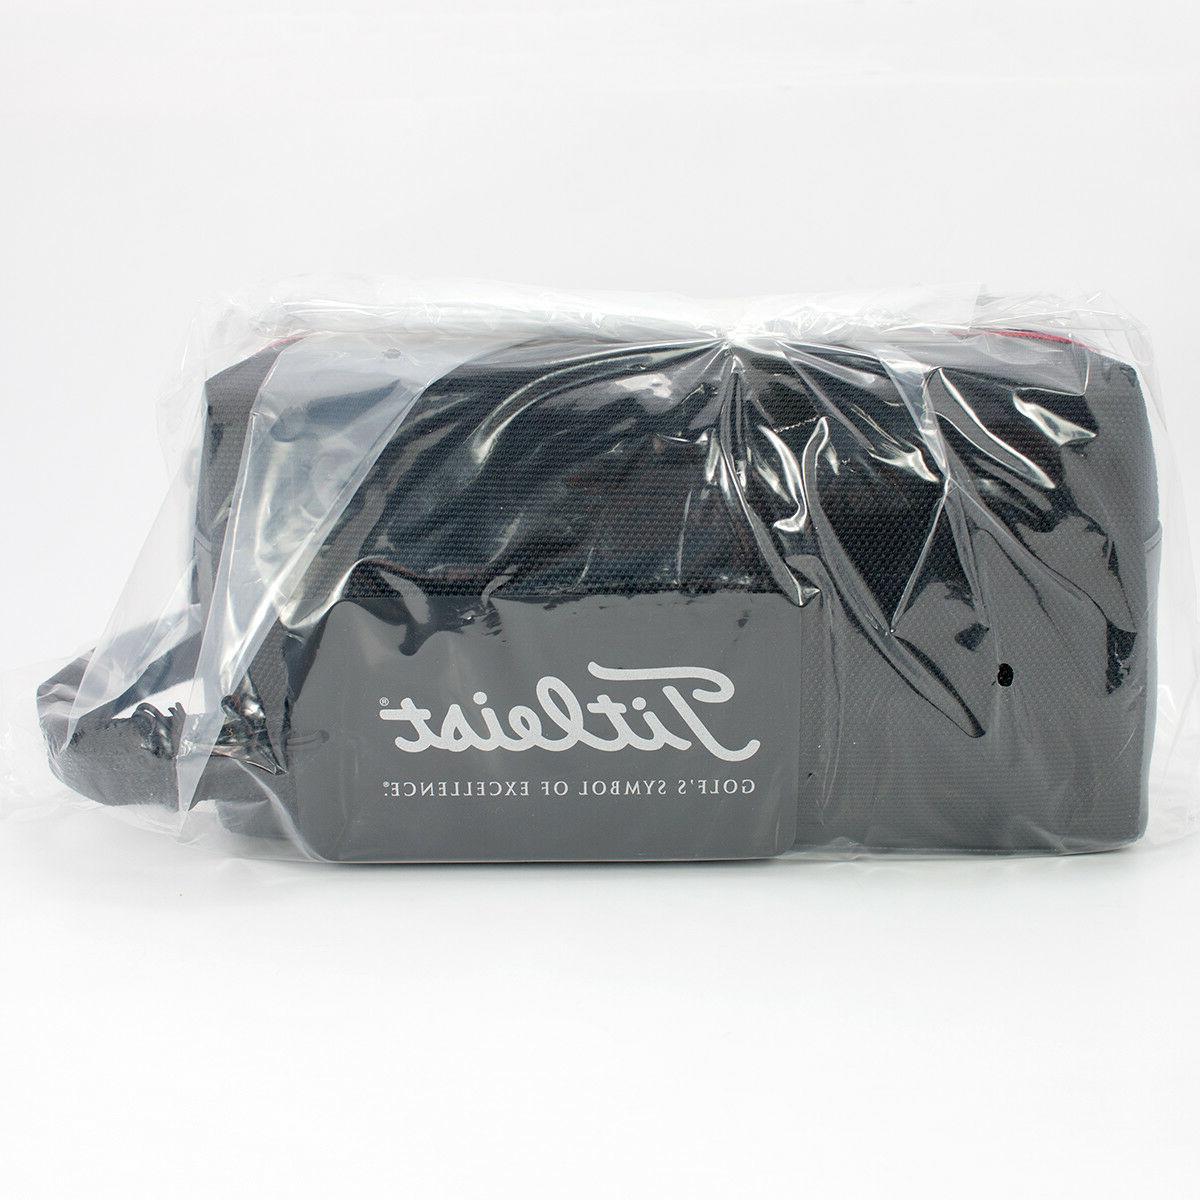 NEW Titleist Golf Professional Travel Gear Zippered Pouch Black